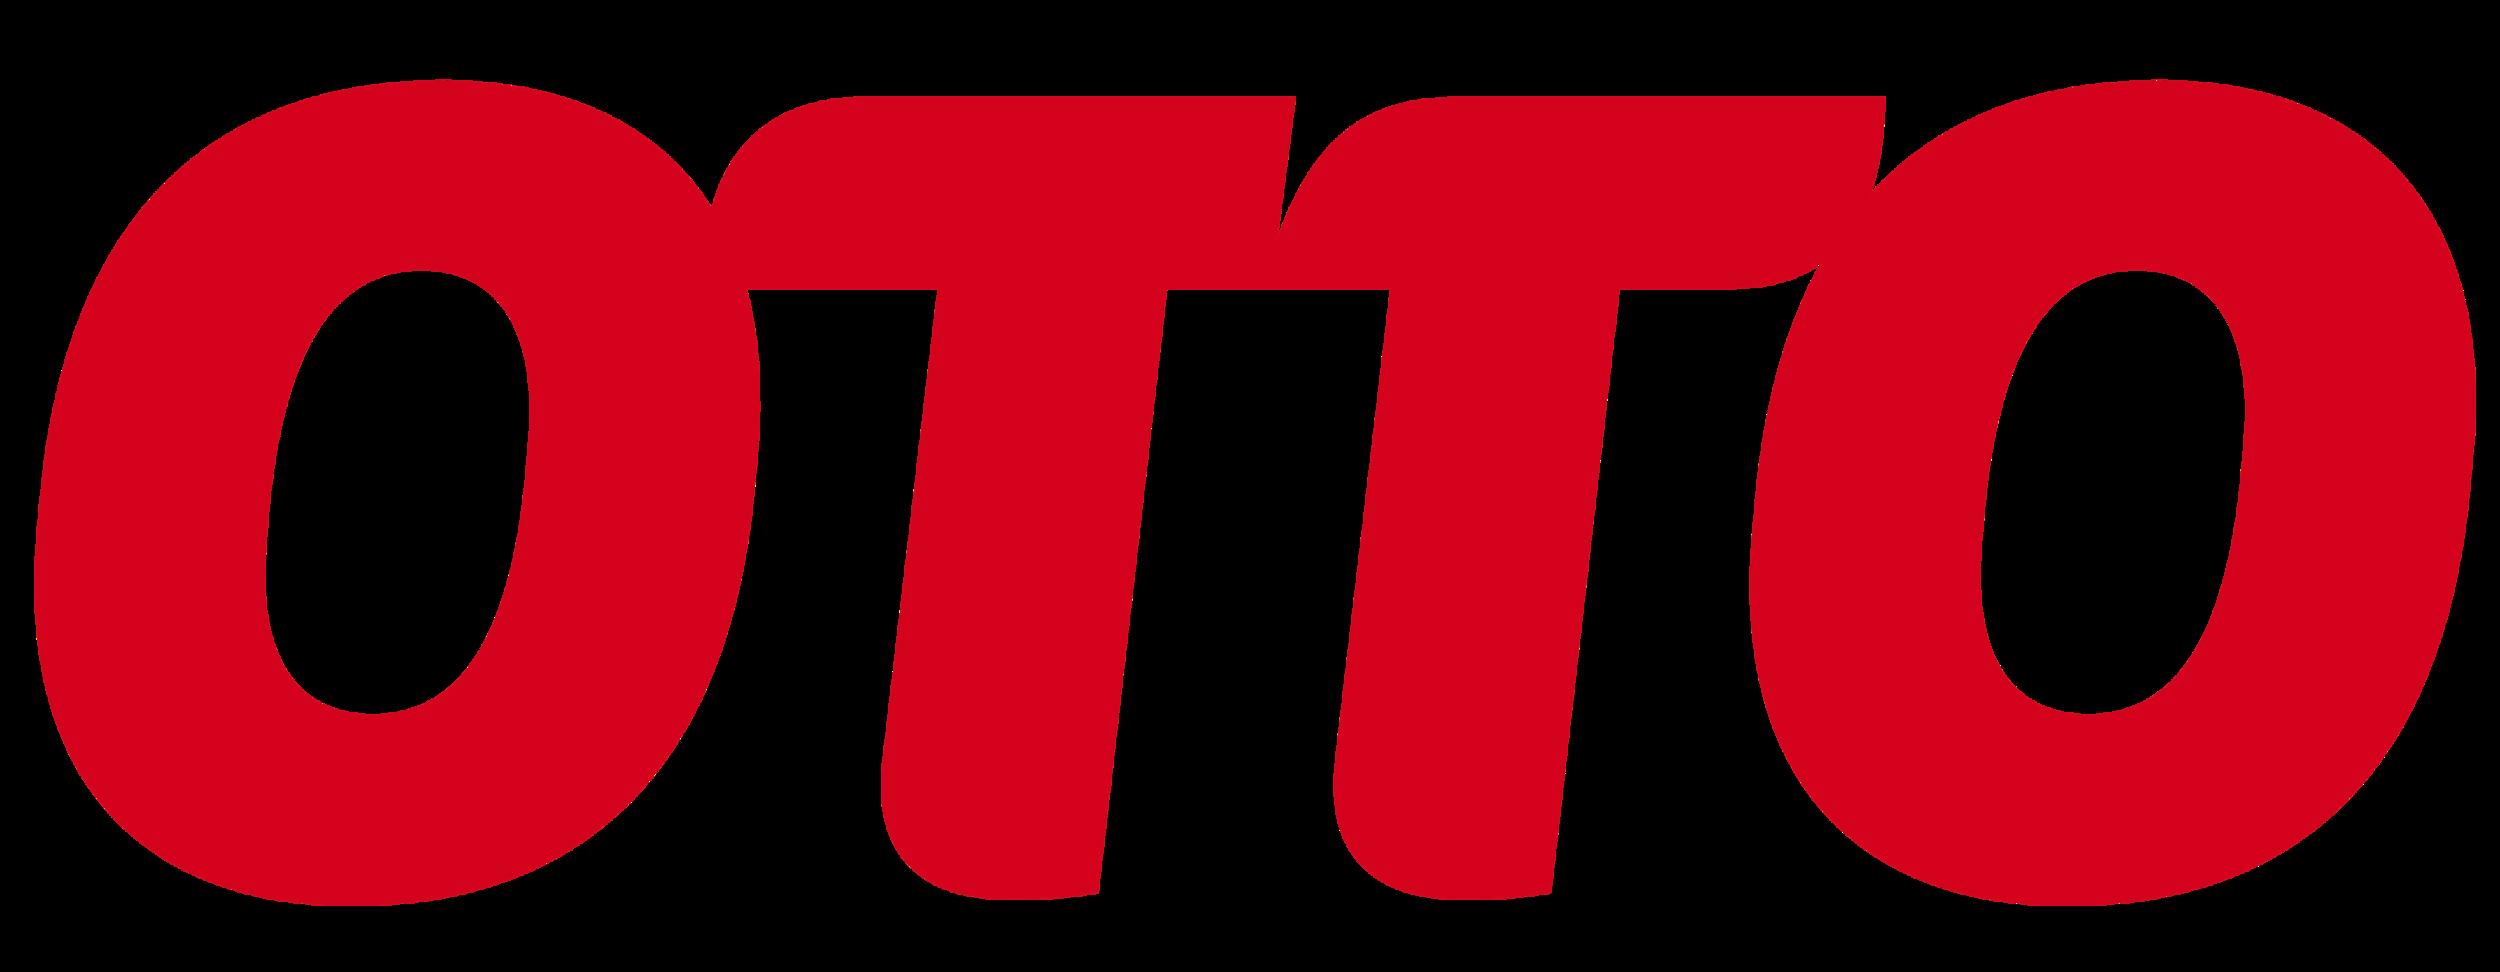 OTTO_logo_wordmark.png